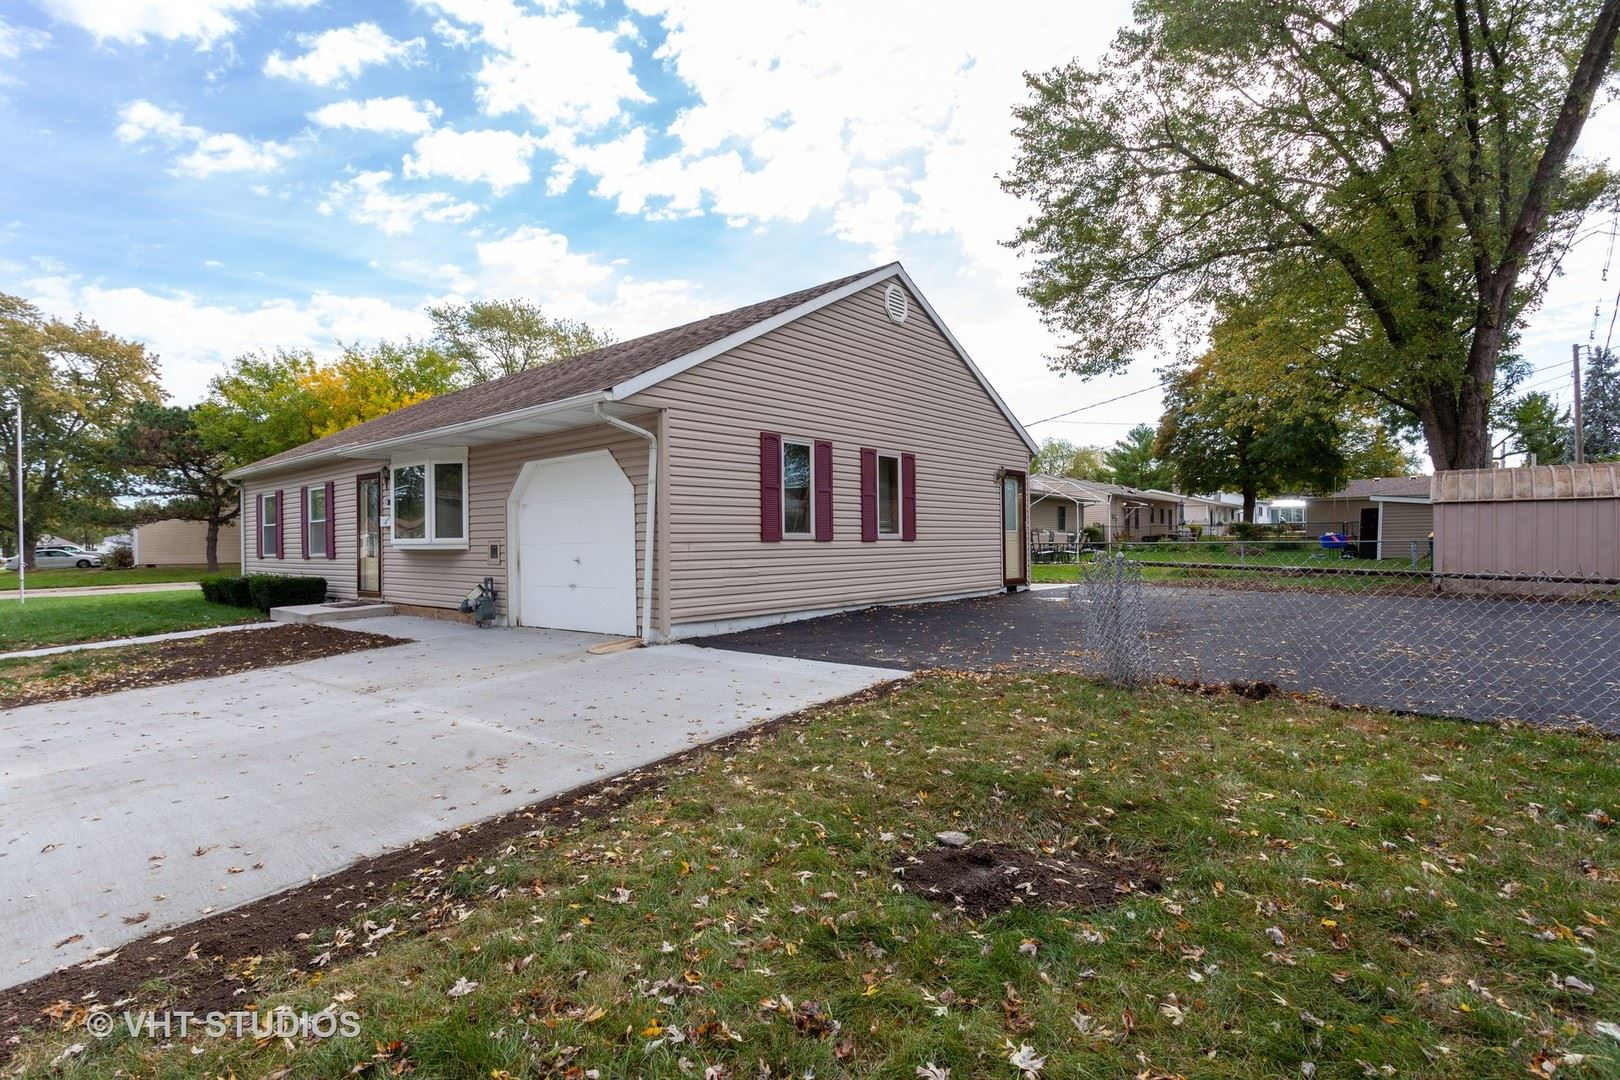 Photo of 301 Belmont Drive, Romeoville, IL 60446 (MLS # 10882416)